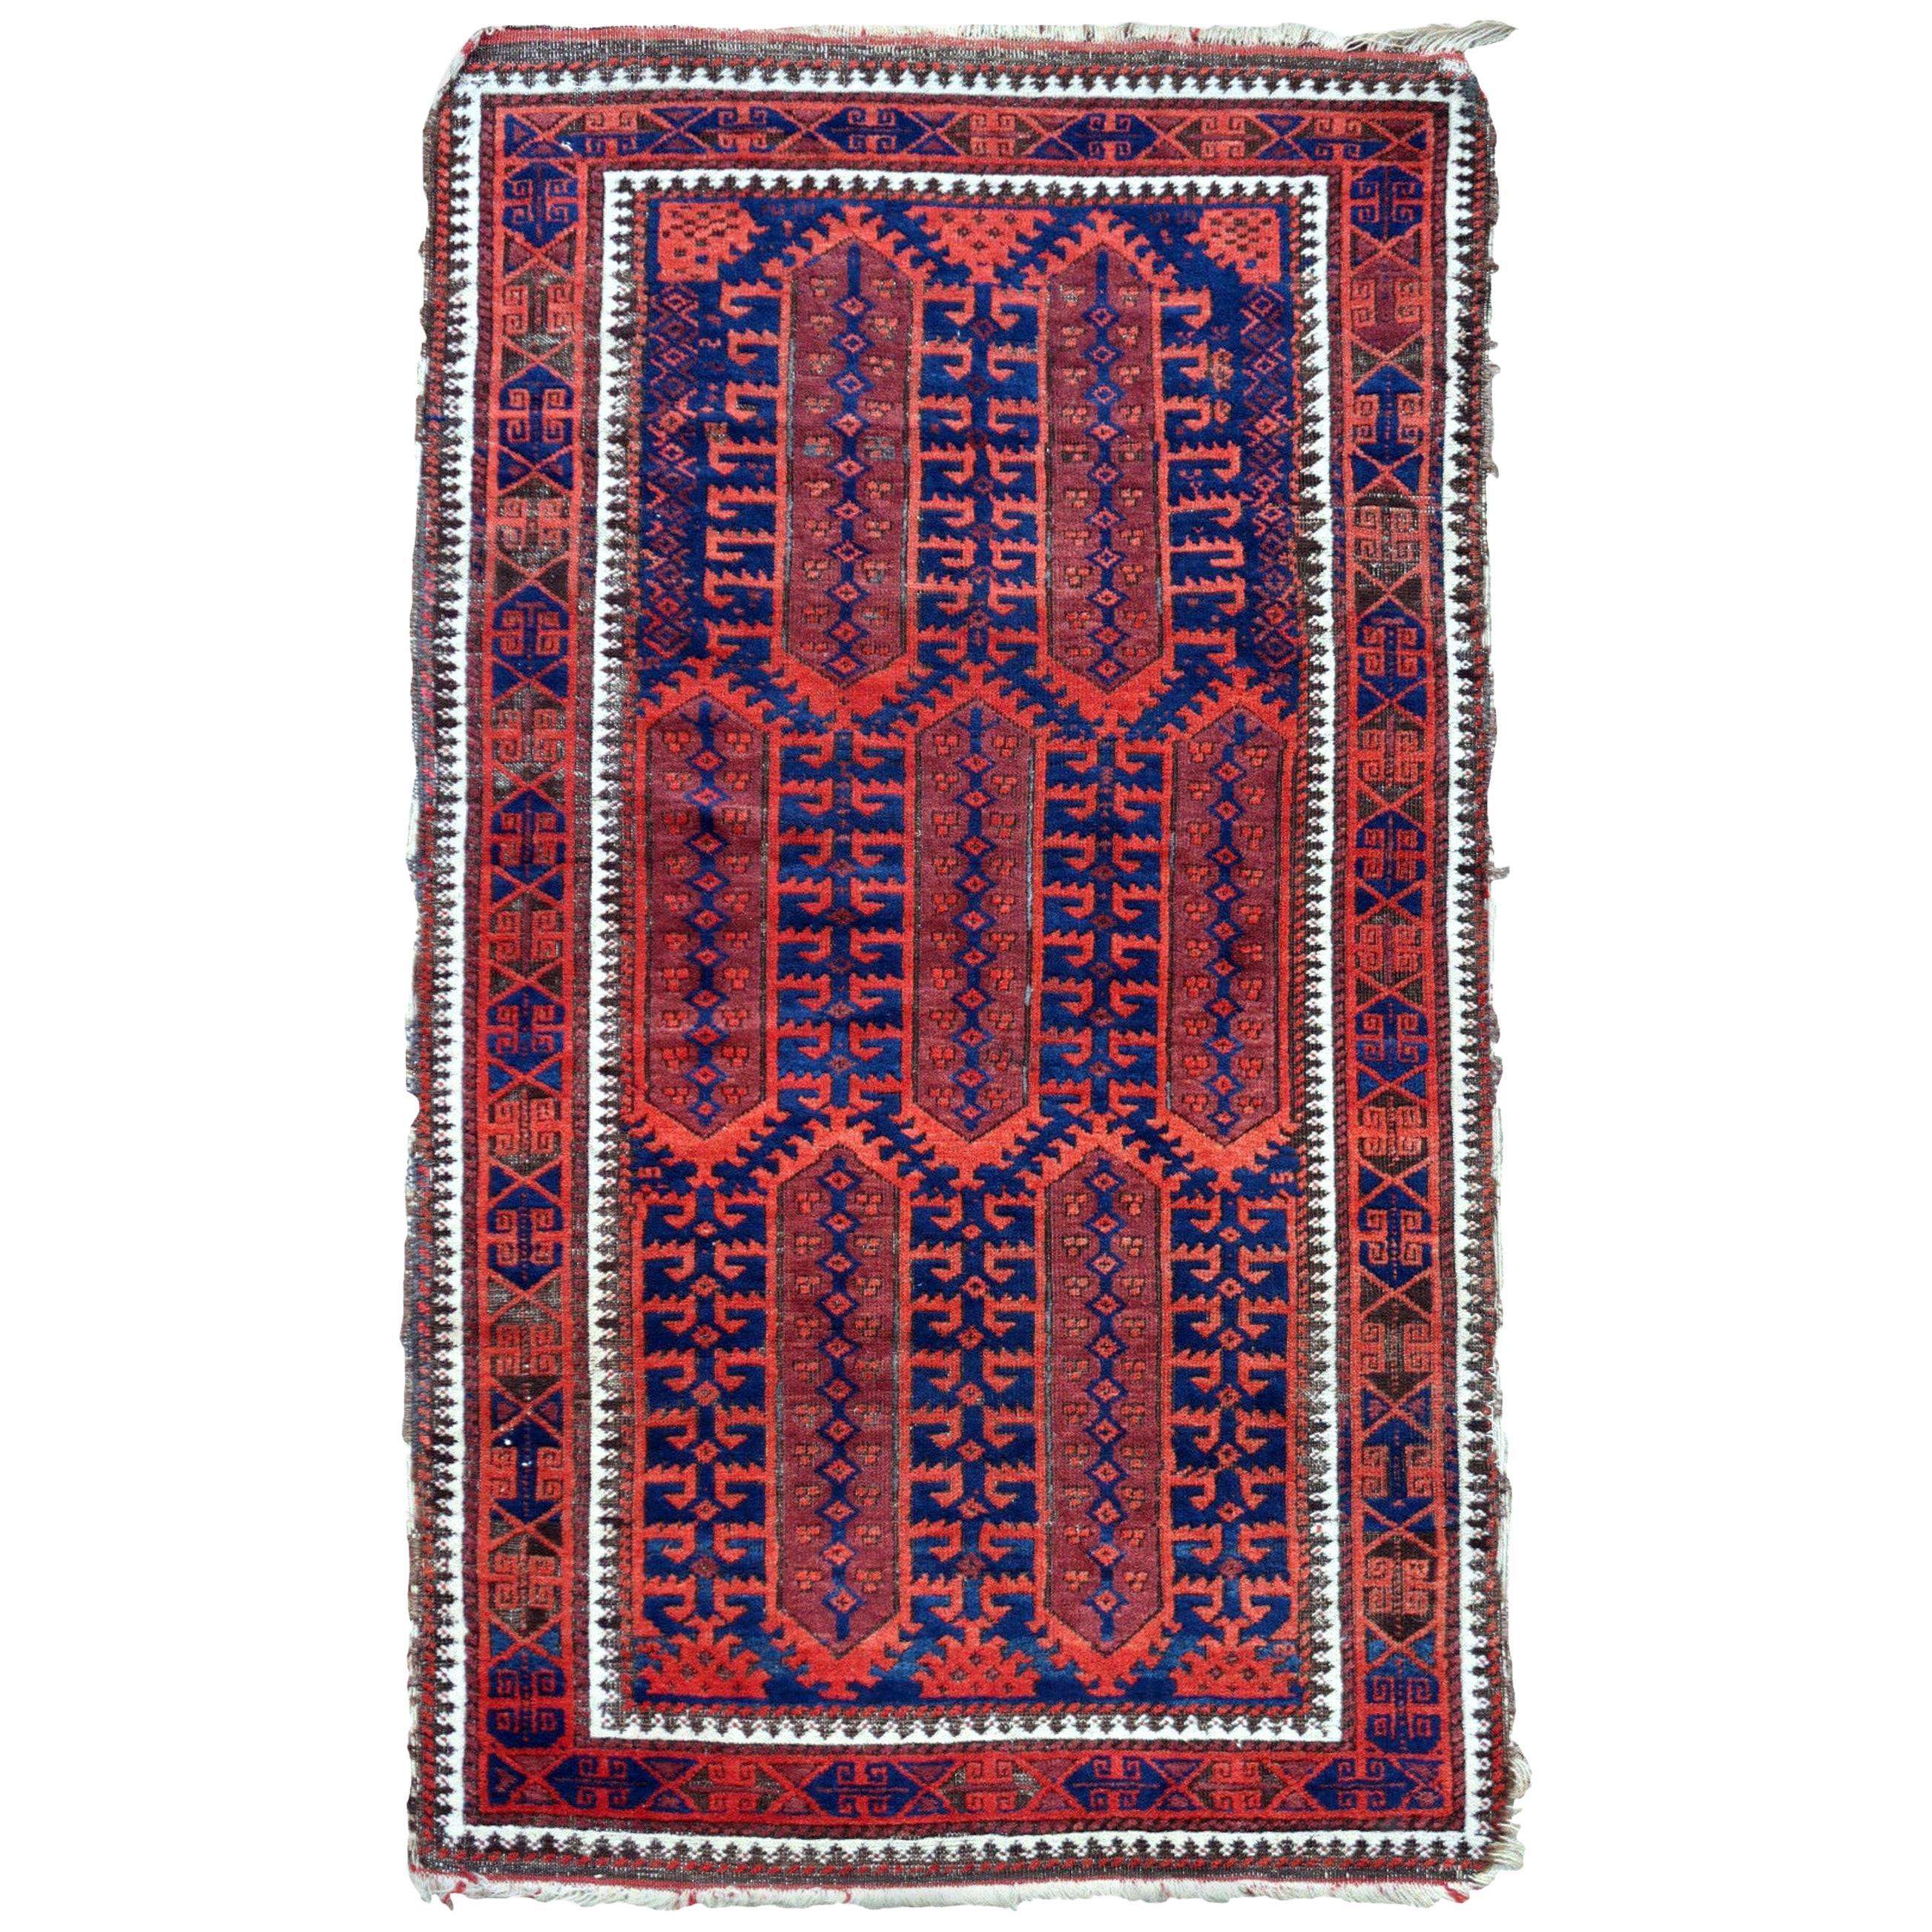 Handmade Antique Afghan Baluch Rug, 1900s, 1P29